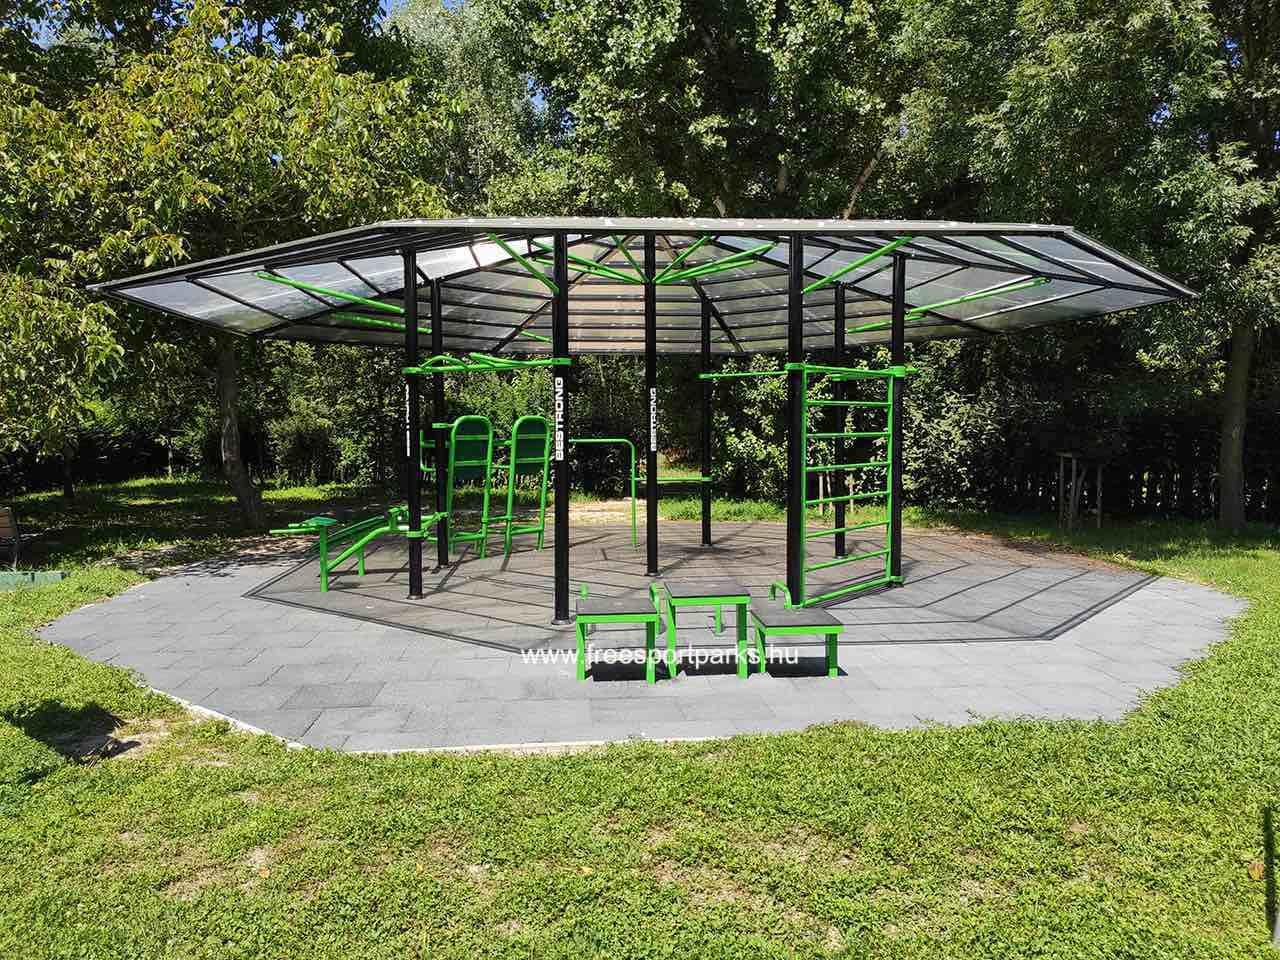 Gladiátor utca - Óbudai kondipark (Street Workout Park) - Free Sport Parks térkép